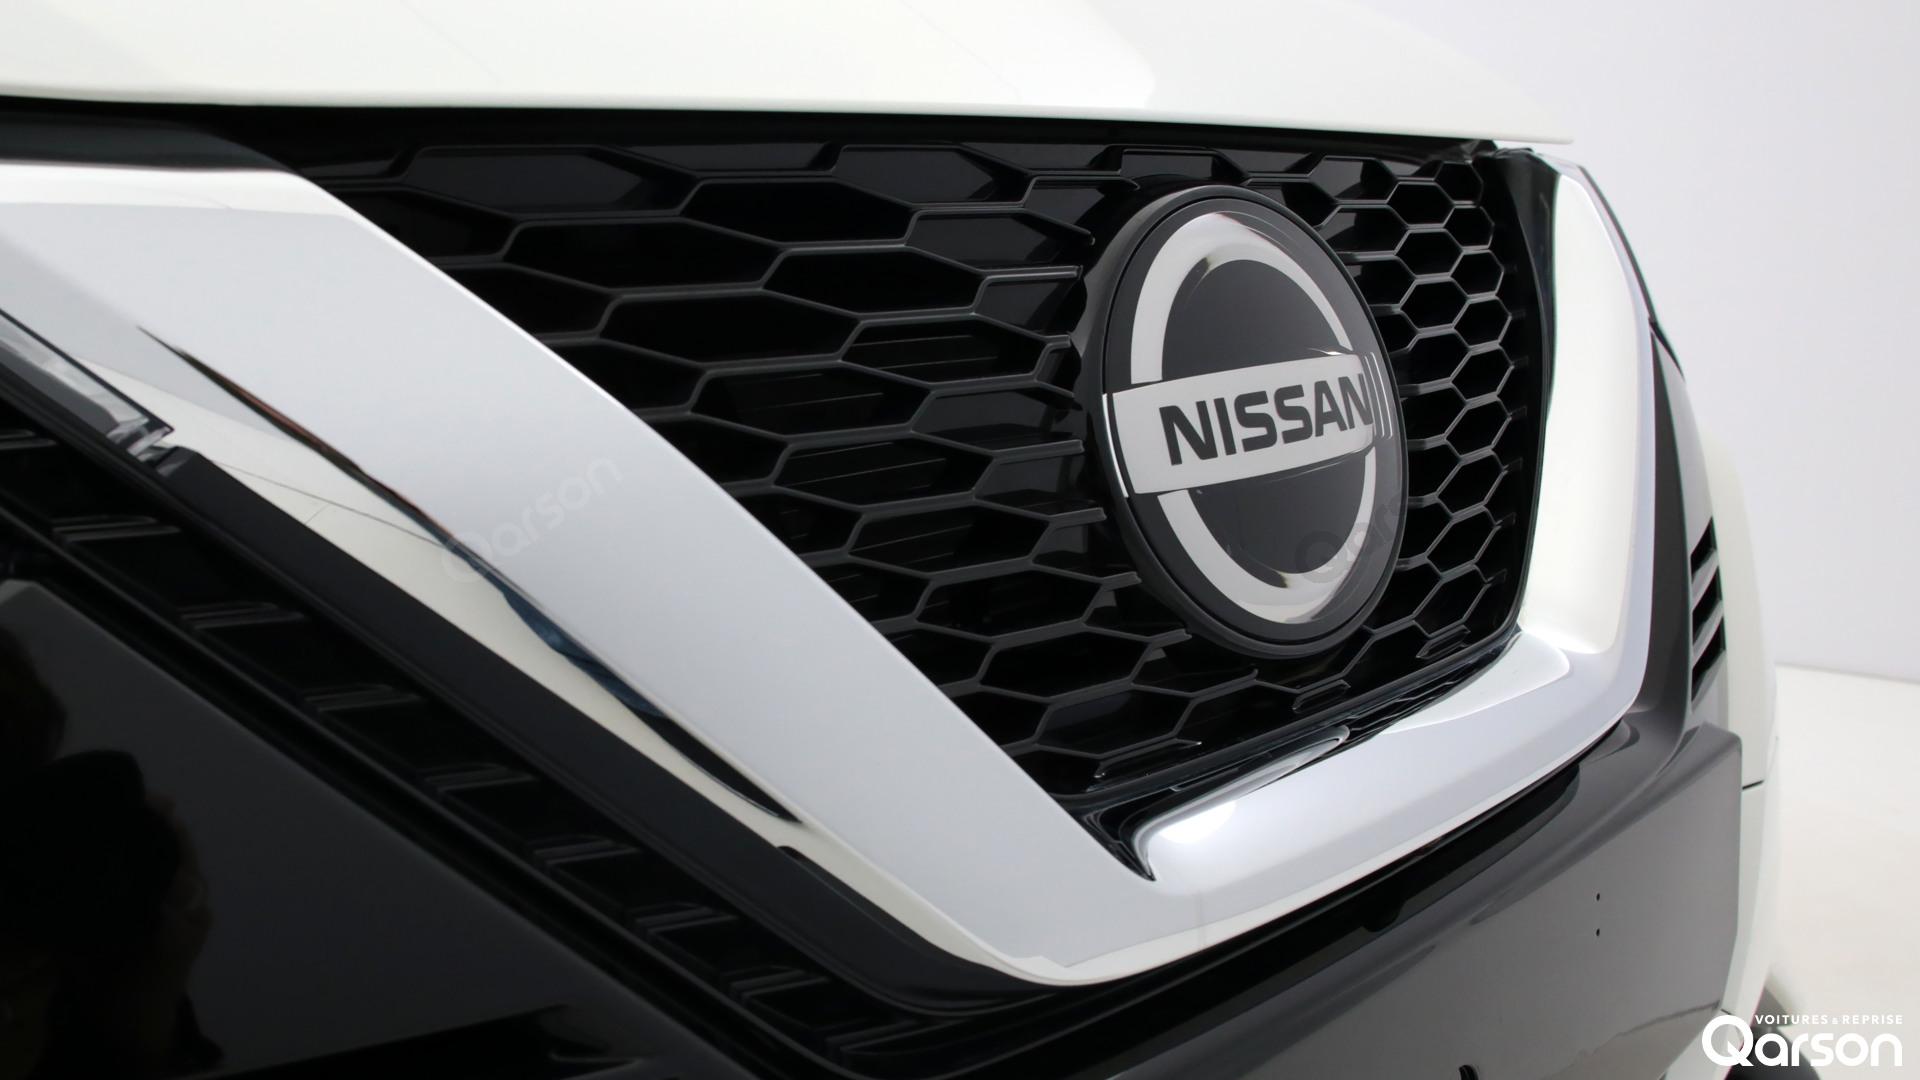 Vue exterieur Nissan Qashqai